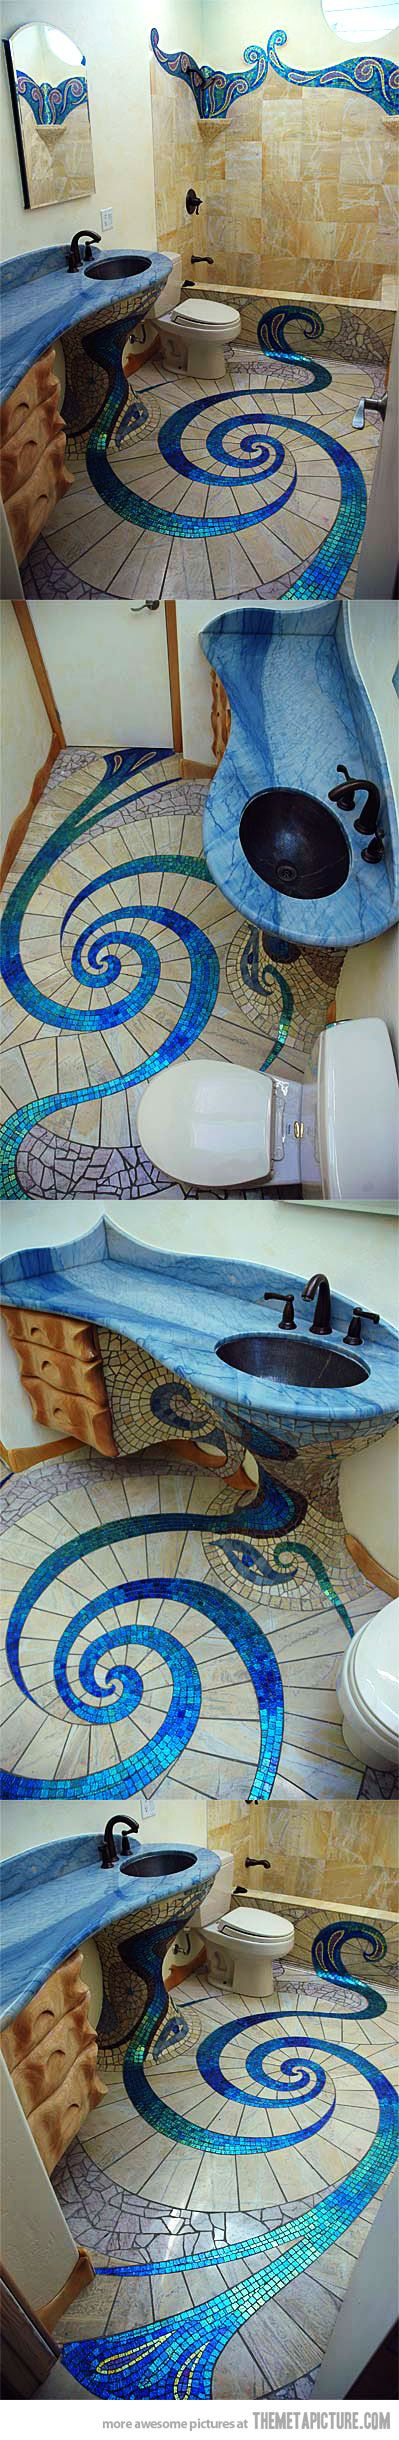 cOOL BATHROOM: Idea, Mermaid Bathroom, Awesome Bathroom, Tile, Amazing Bathroom, House, Mosaic, Dream Bathroom